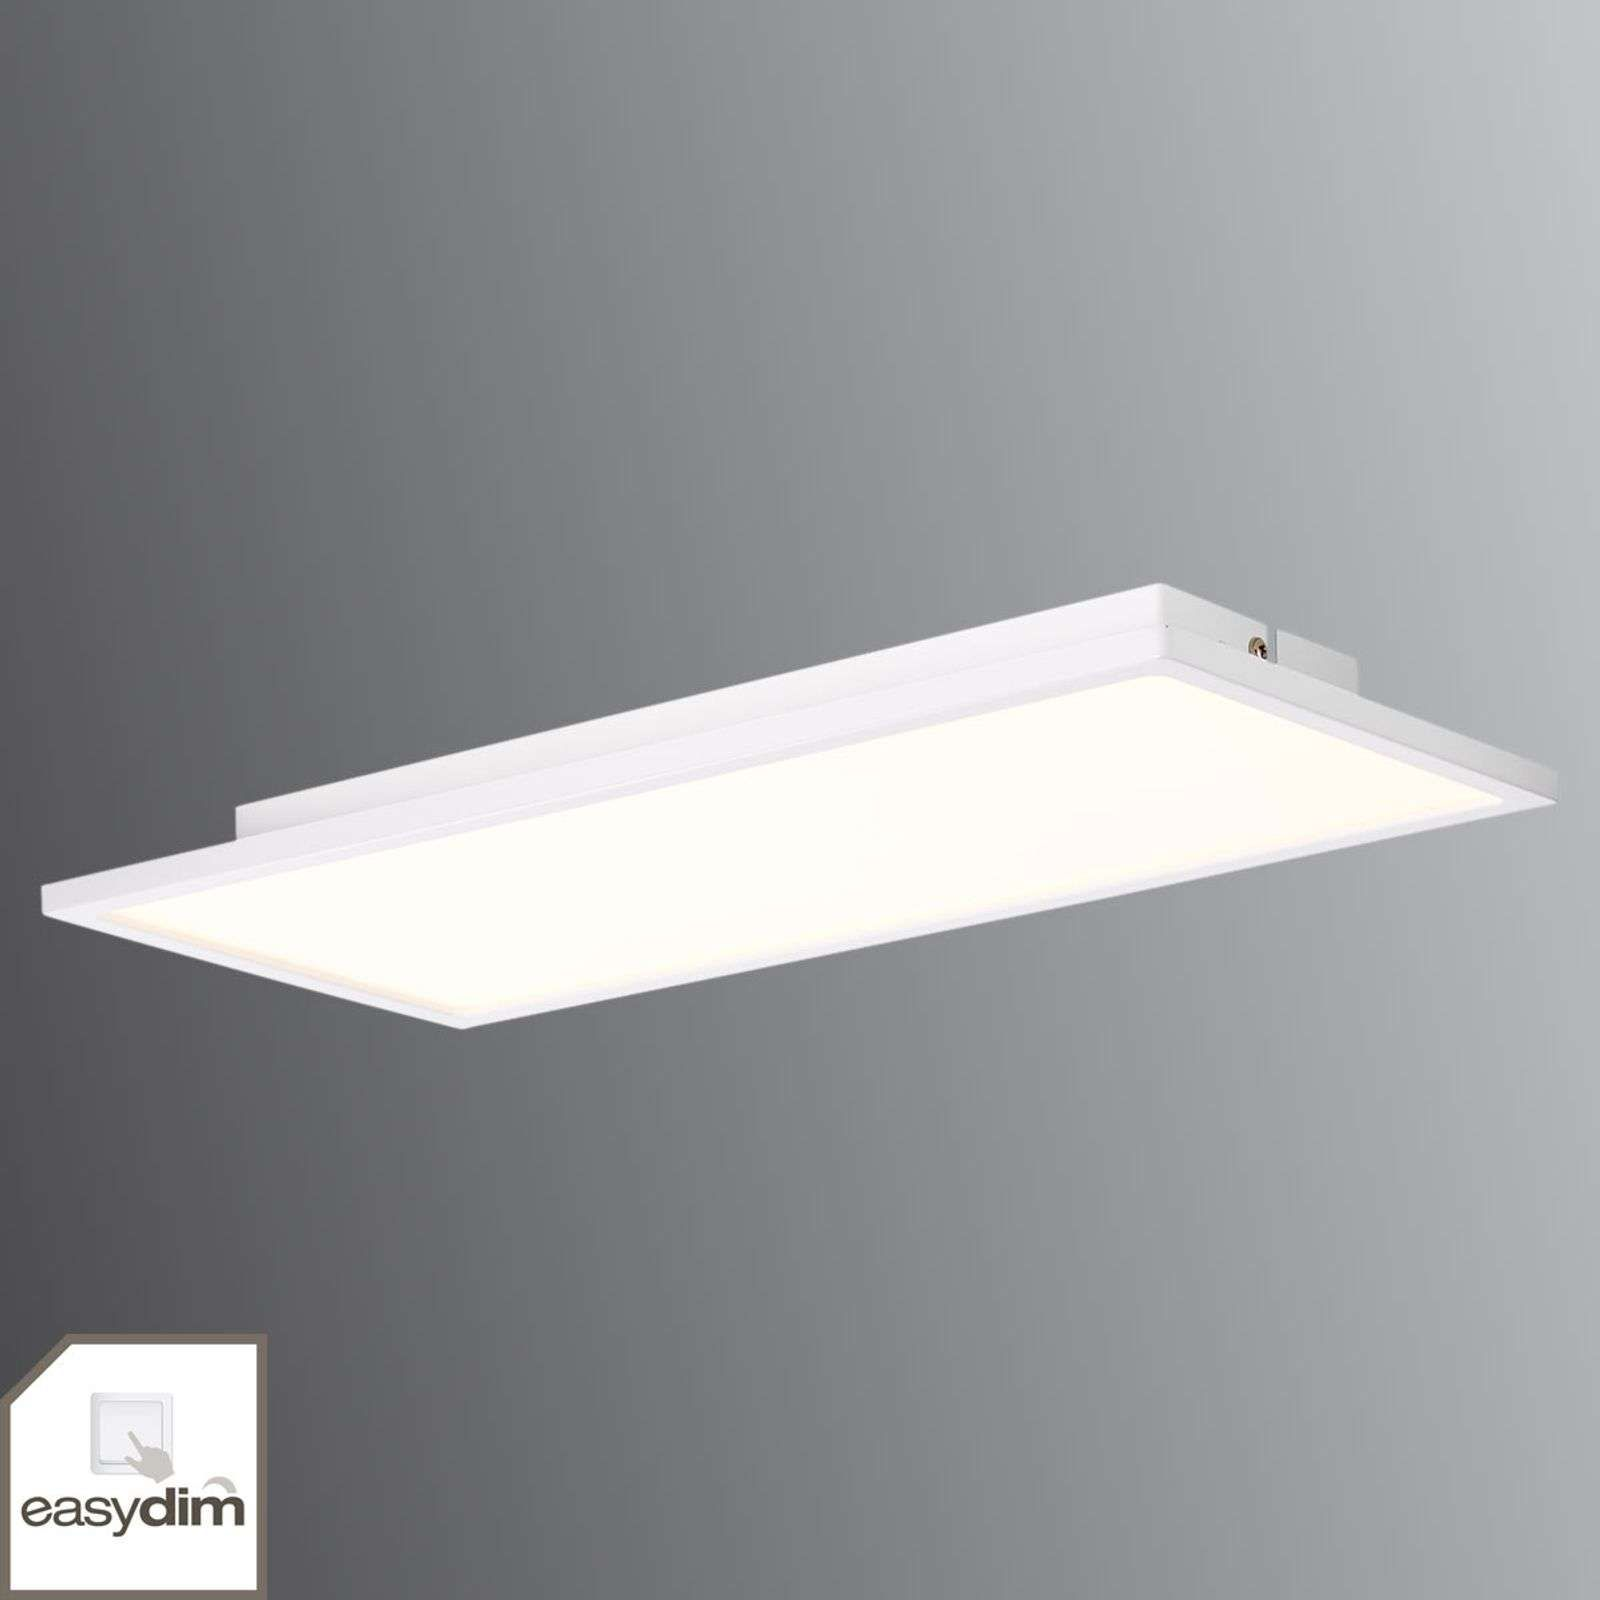 Ceres Led Plafondlamp Dimbaar Via De Lichtscha Plafondlamp Lichtschakelaar Plafondverlichting